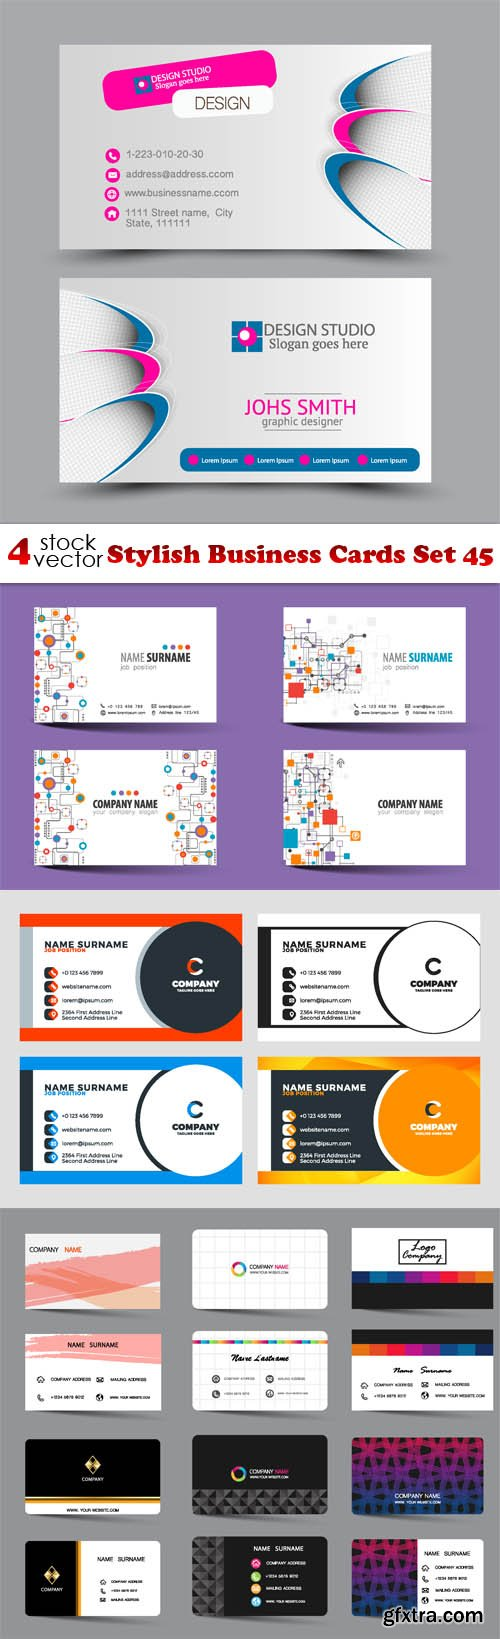 Vectors - Stylish Business Cards Set 45